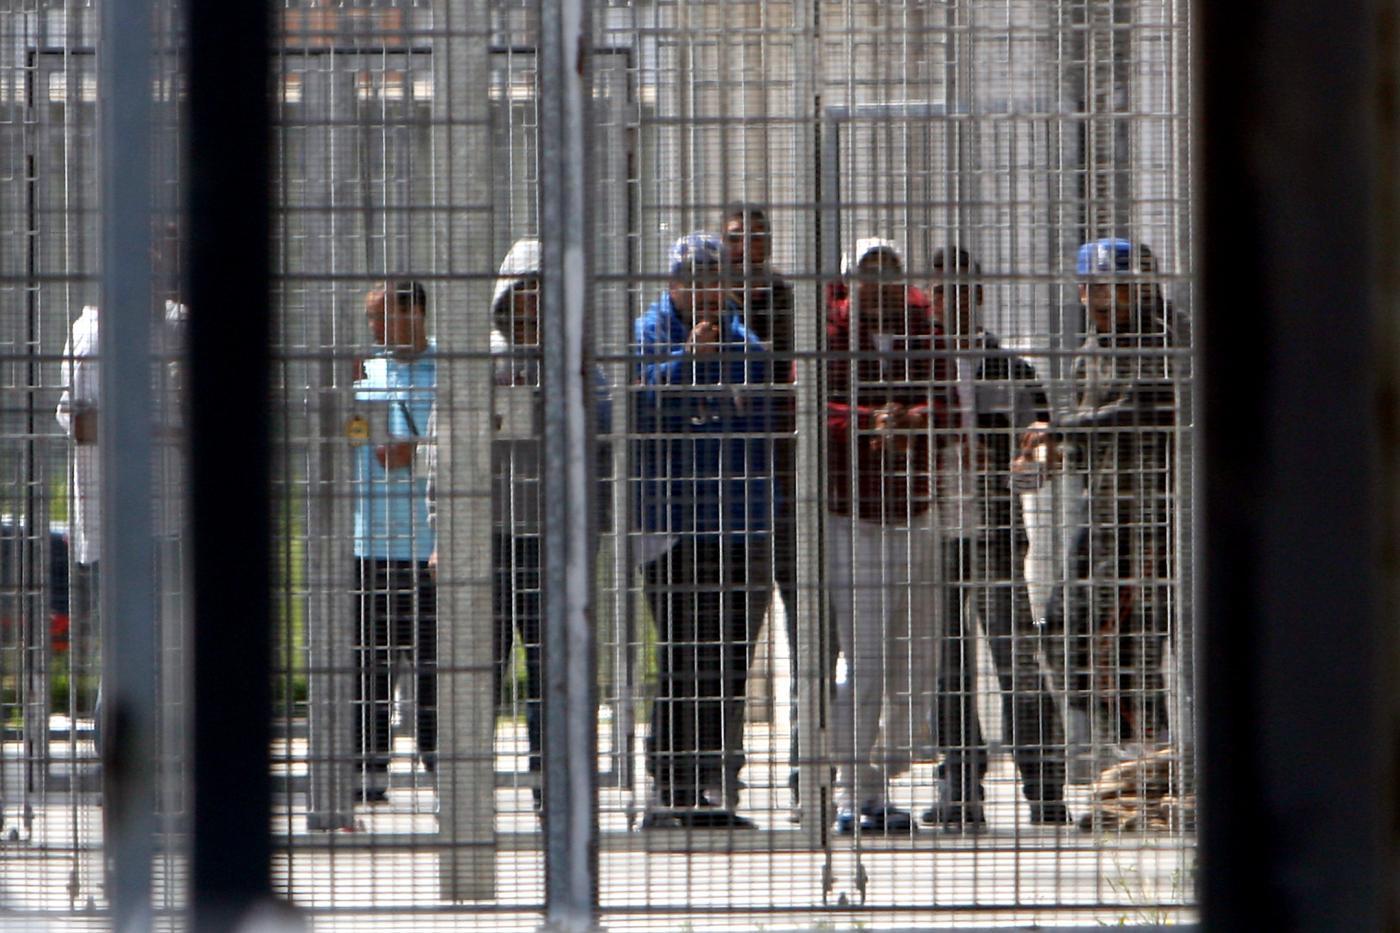 Carta di Roma su Lampedusa: garantite tutela identità rifugiati eritrei